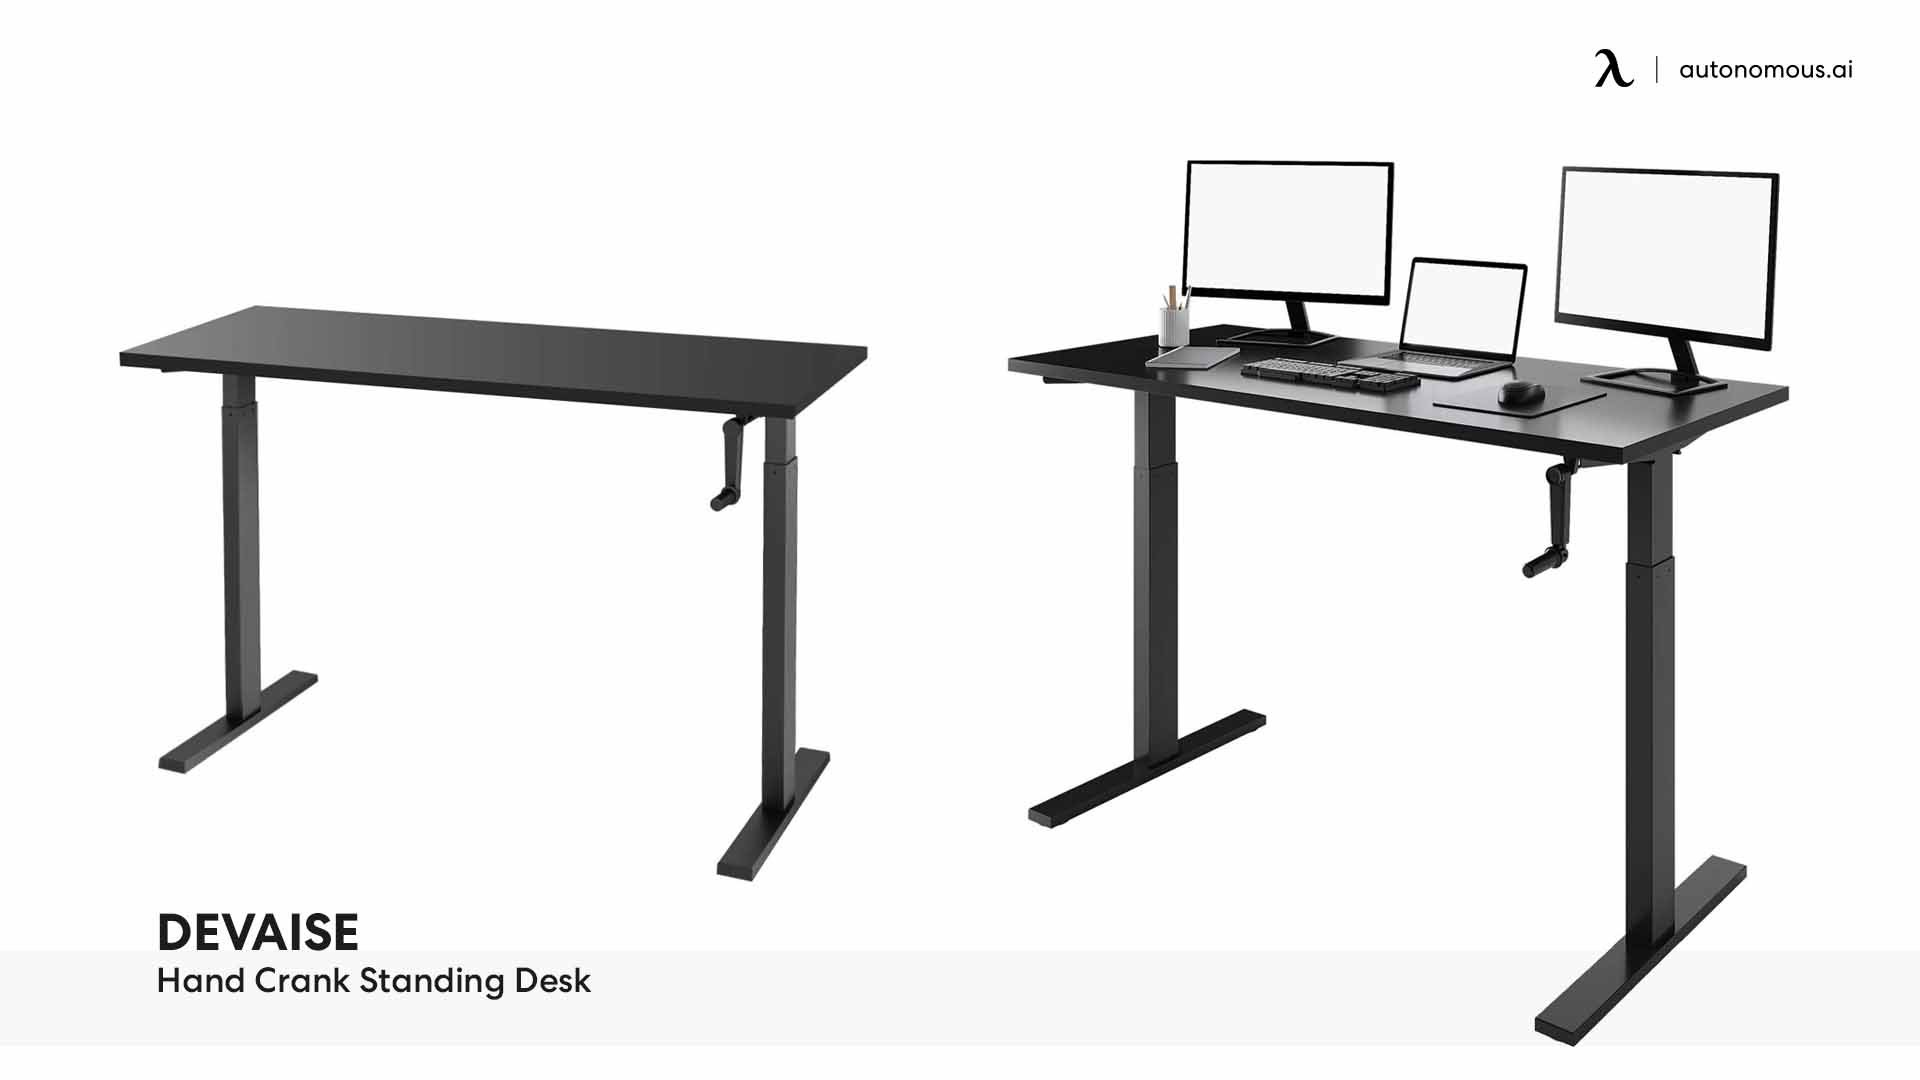 DEVAISE Hand Crank Standing Desk